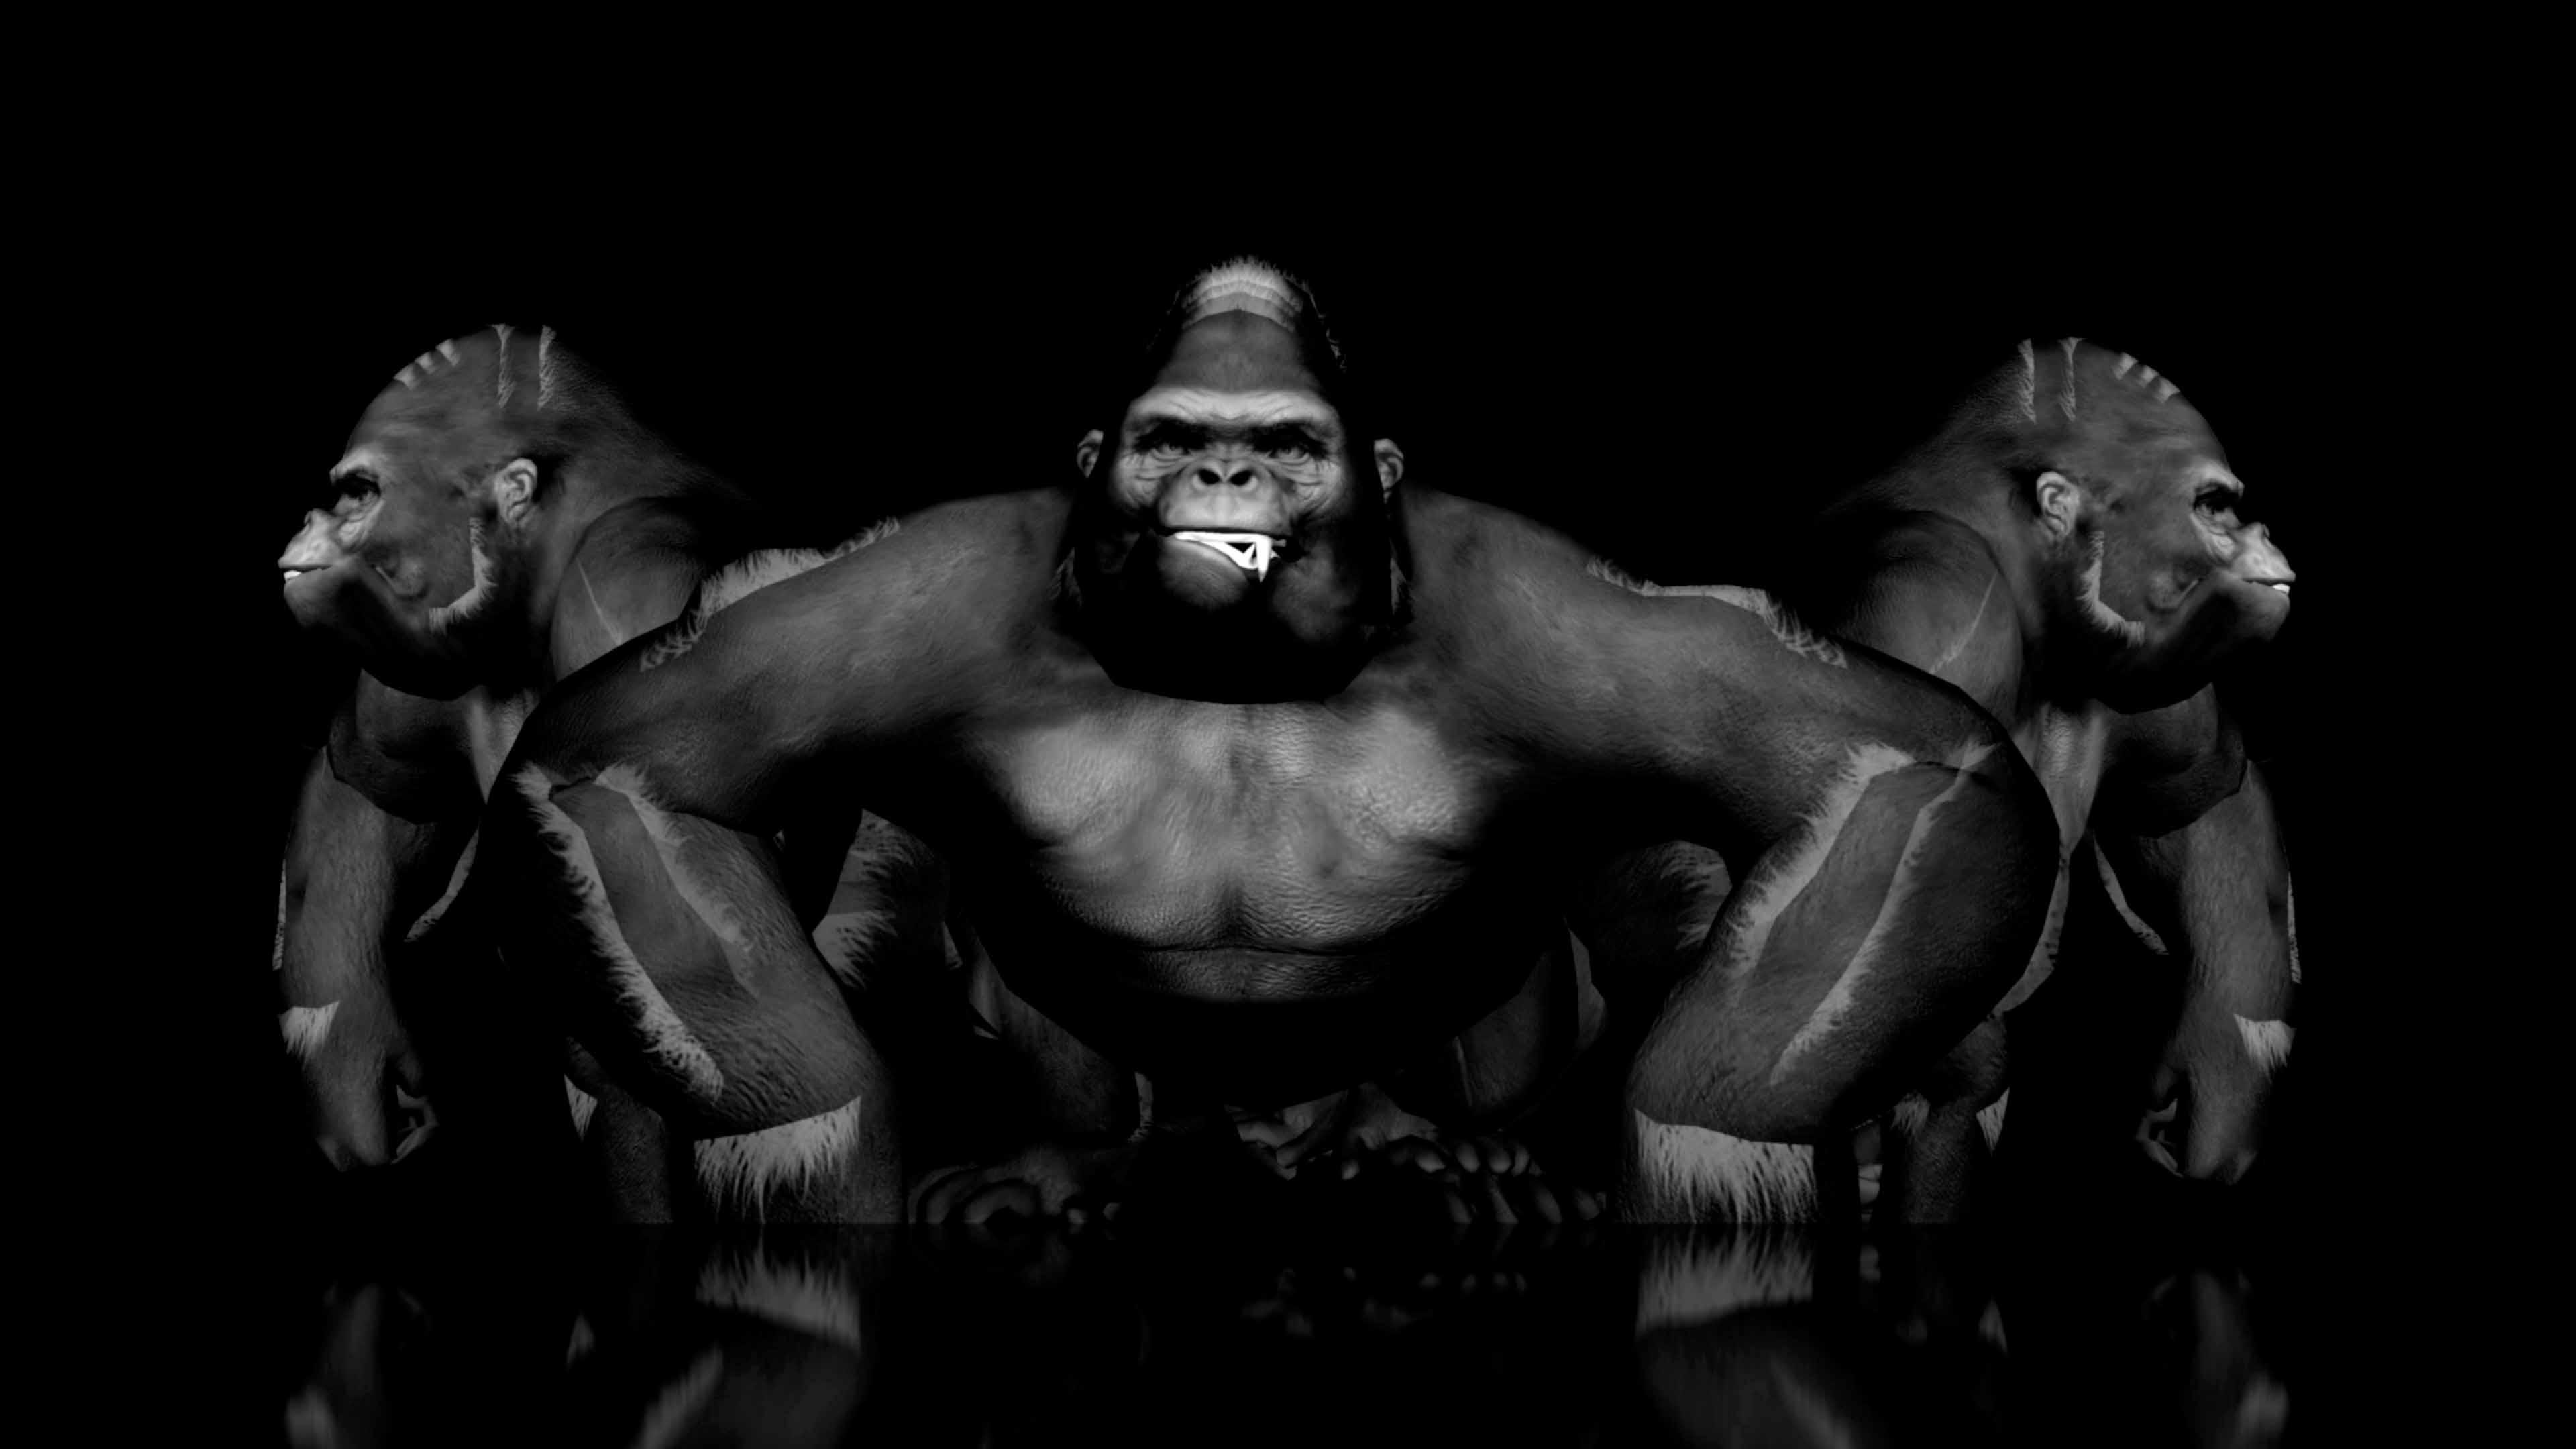 monkey vj loops